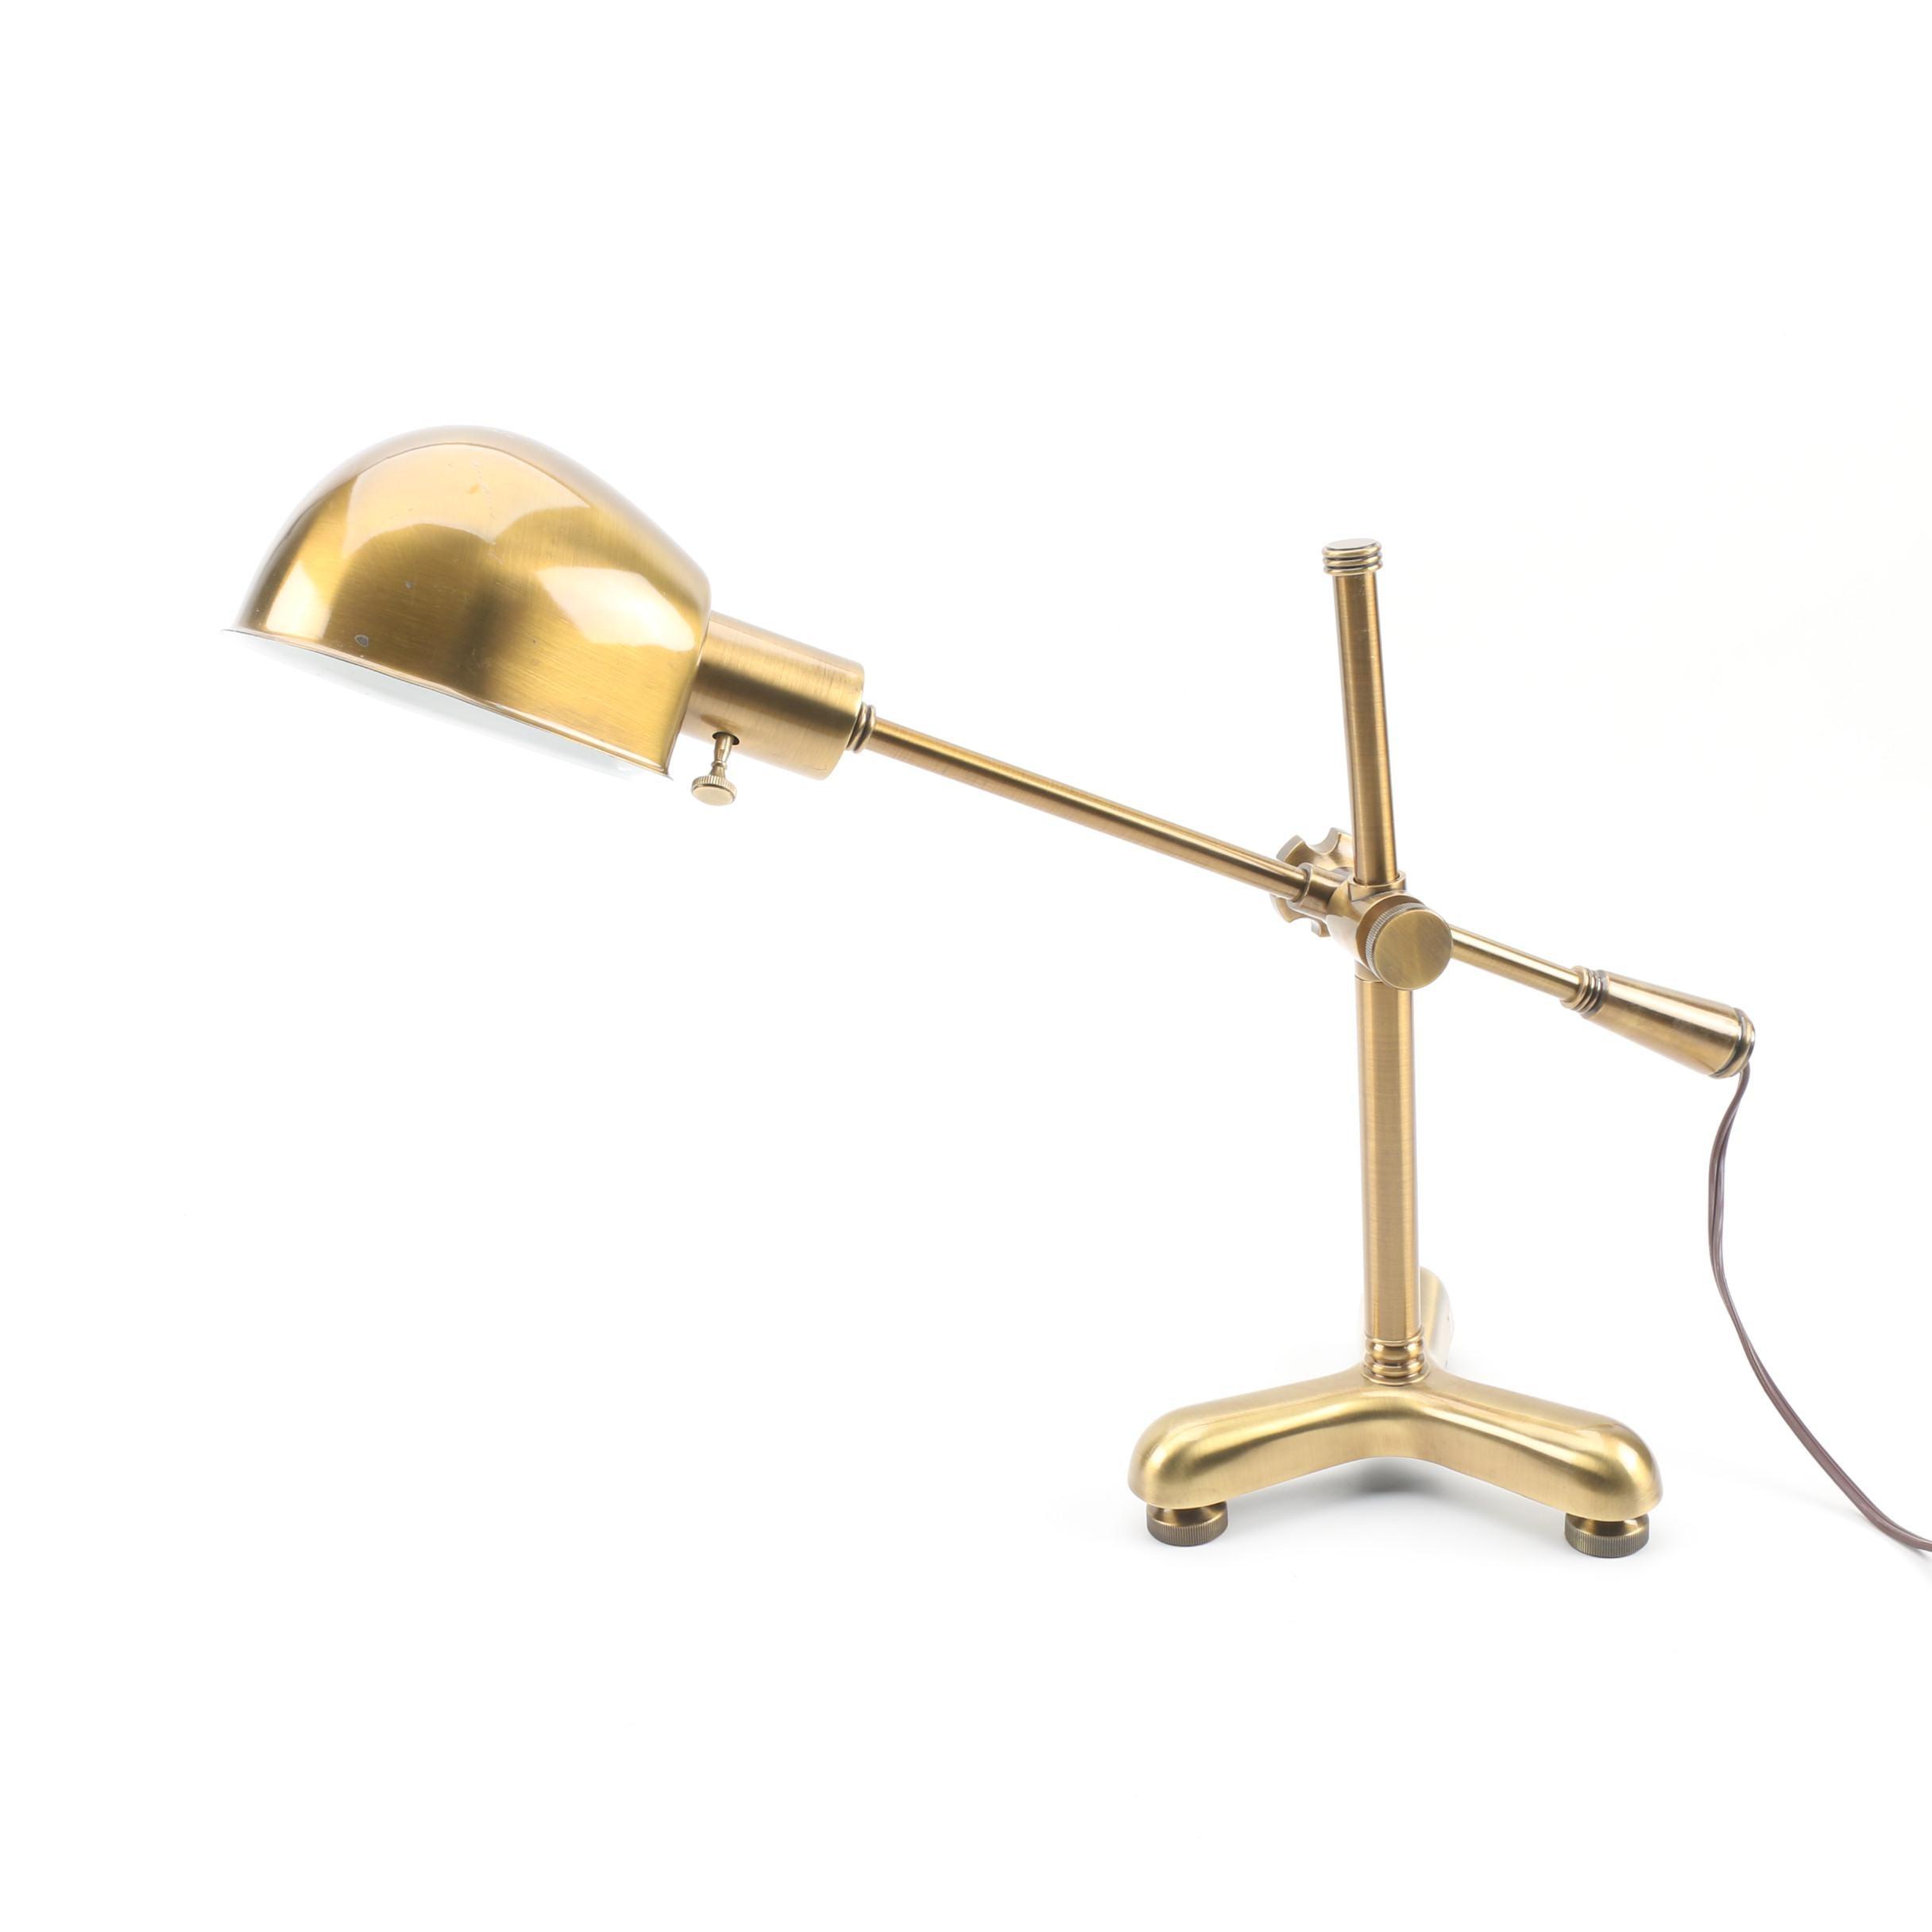 Ralph Lauren Home Lacquered Brass Pharmacy Boom Arm Desk Lamp